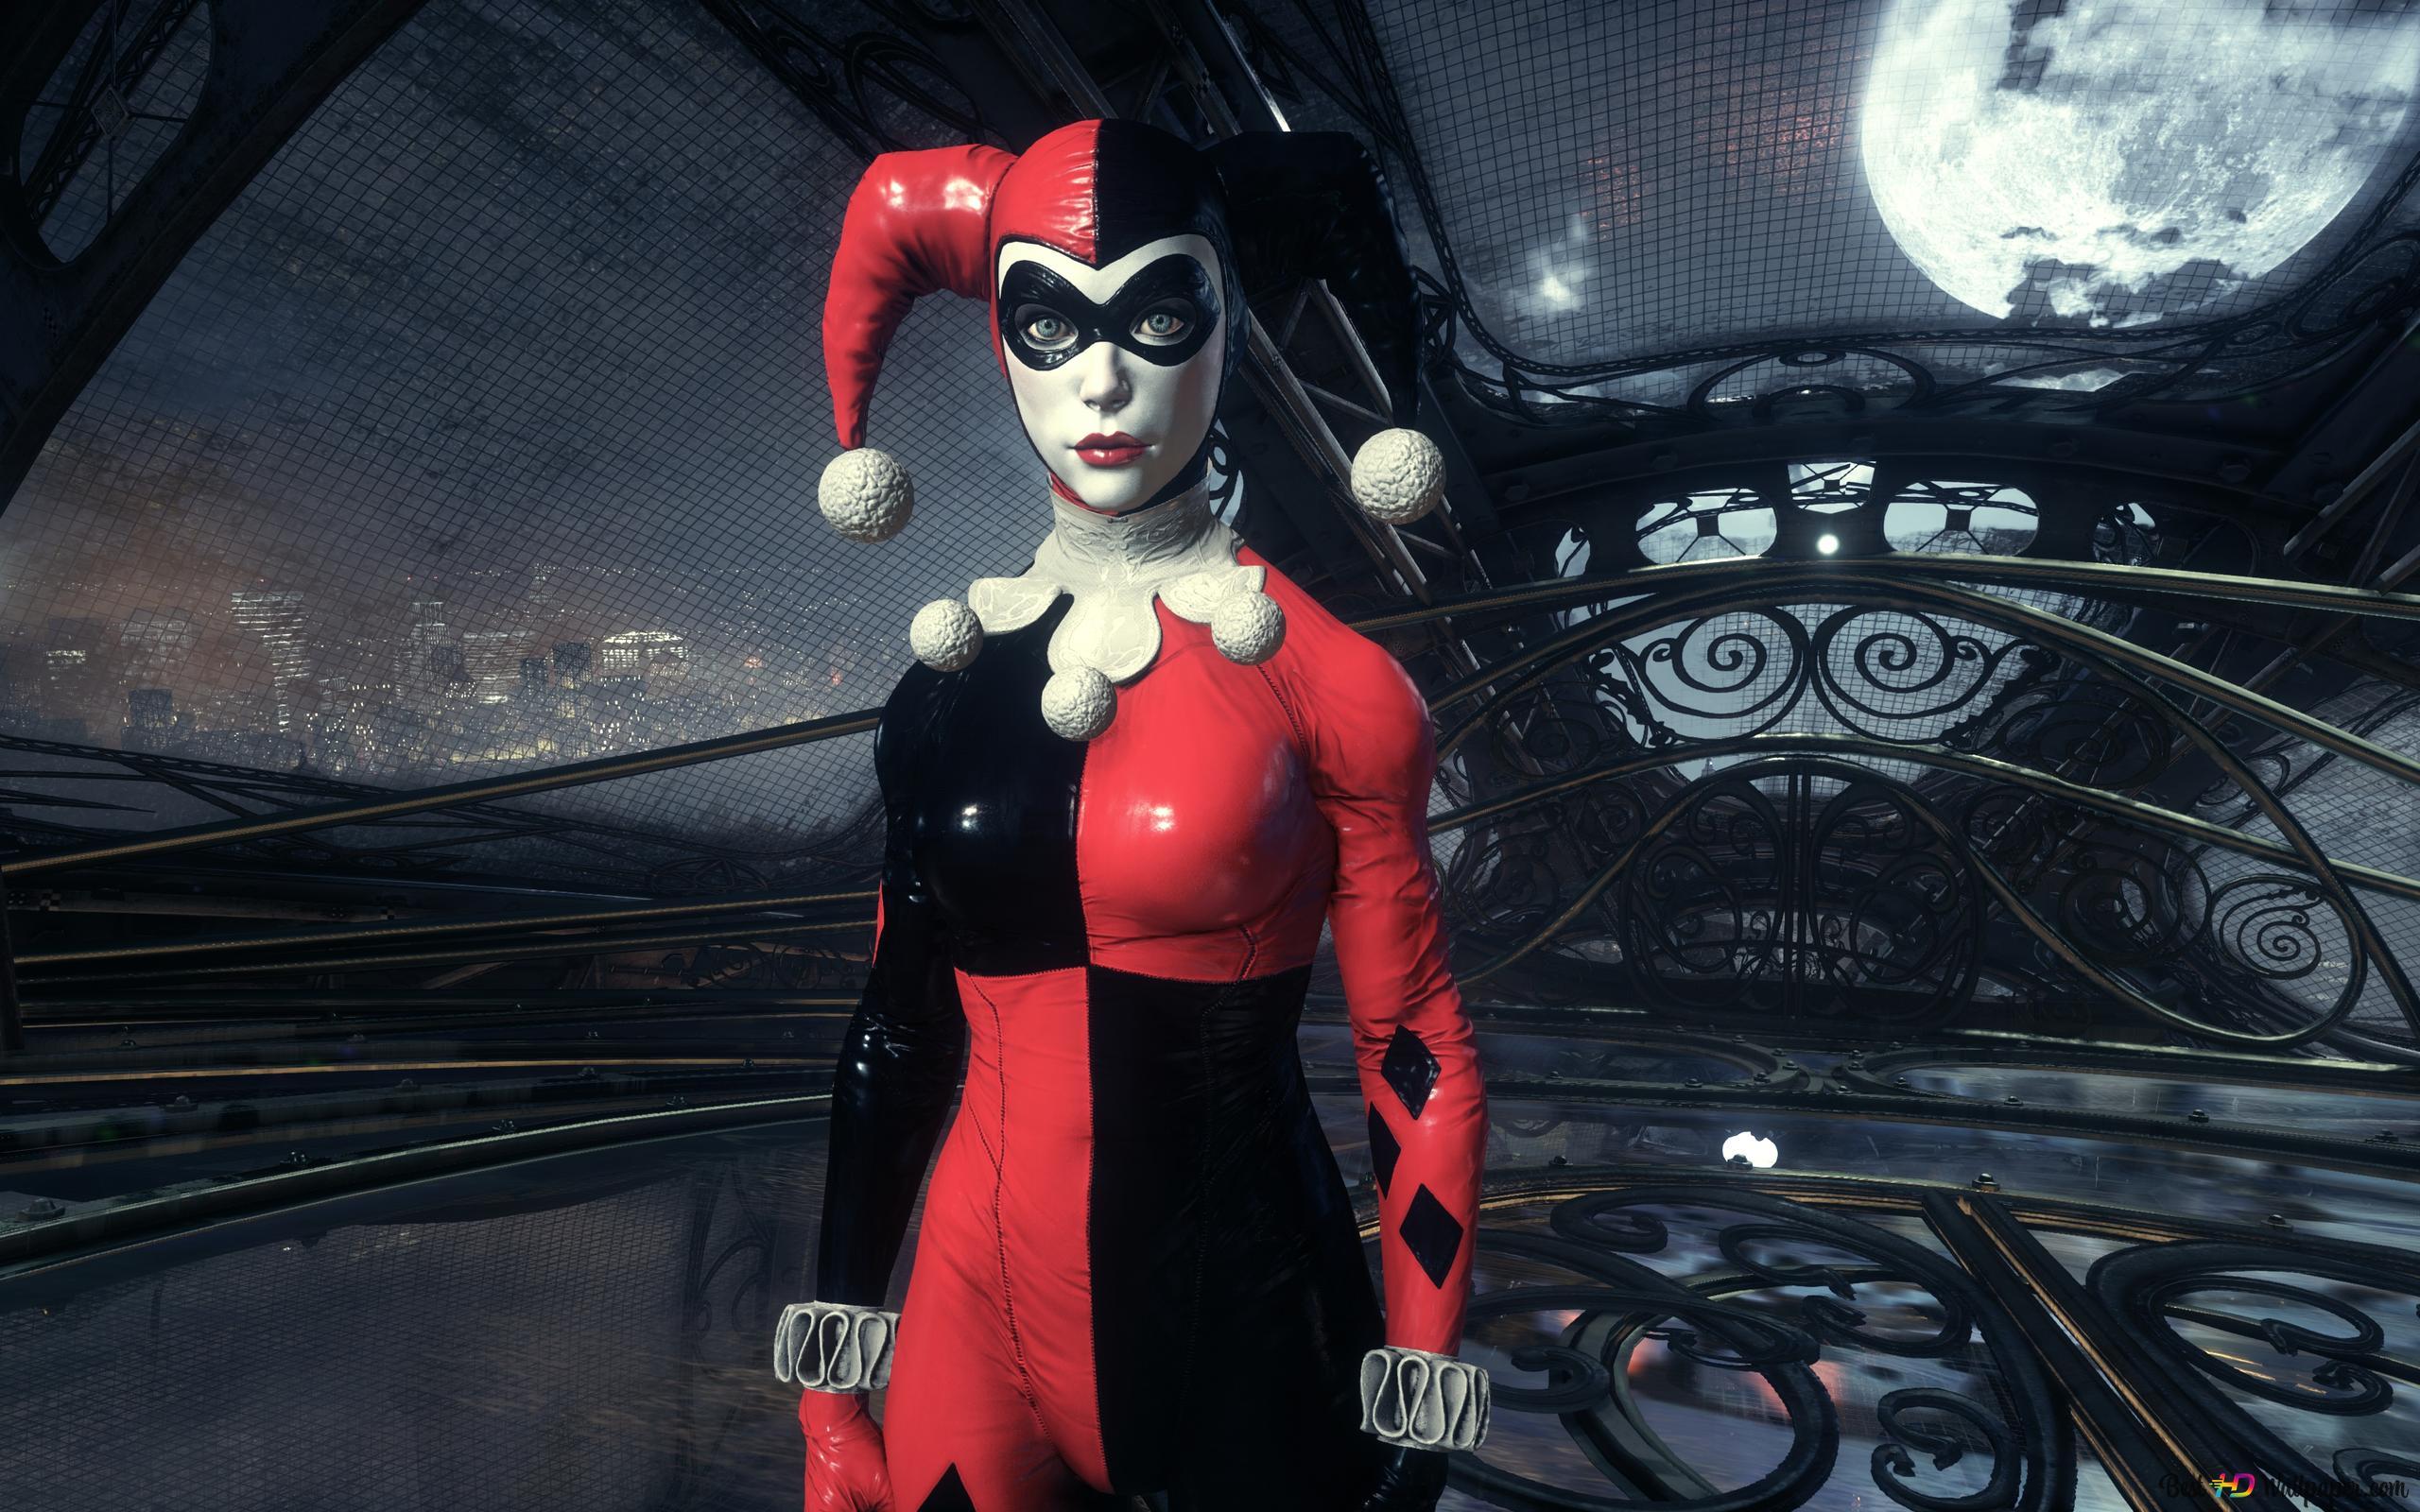 Harley Quinn Jokers Sidekick Hd Wallpaper Download